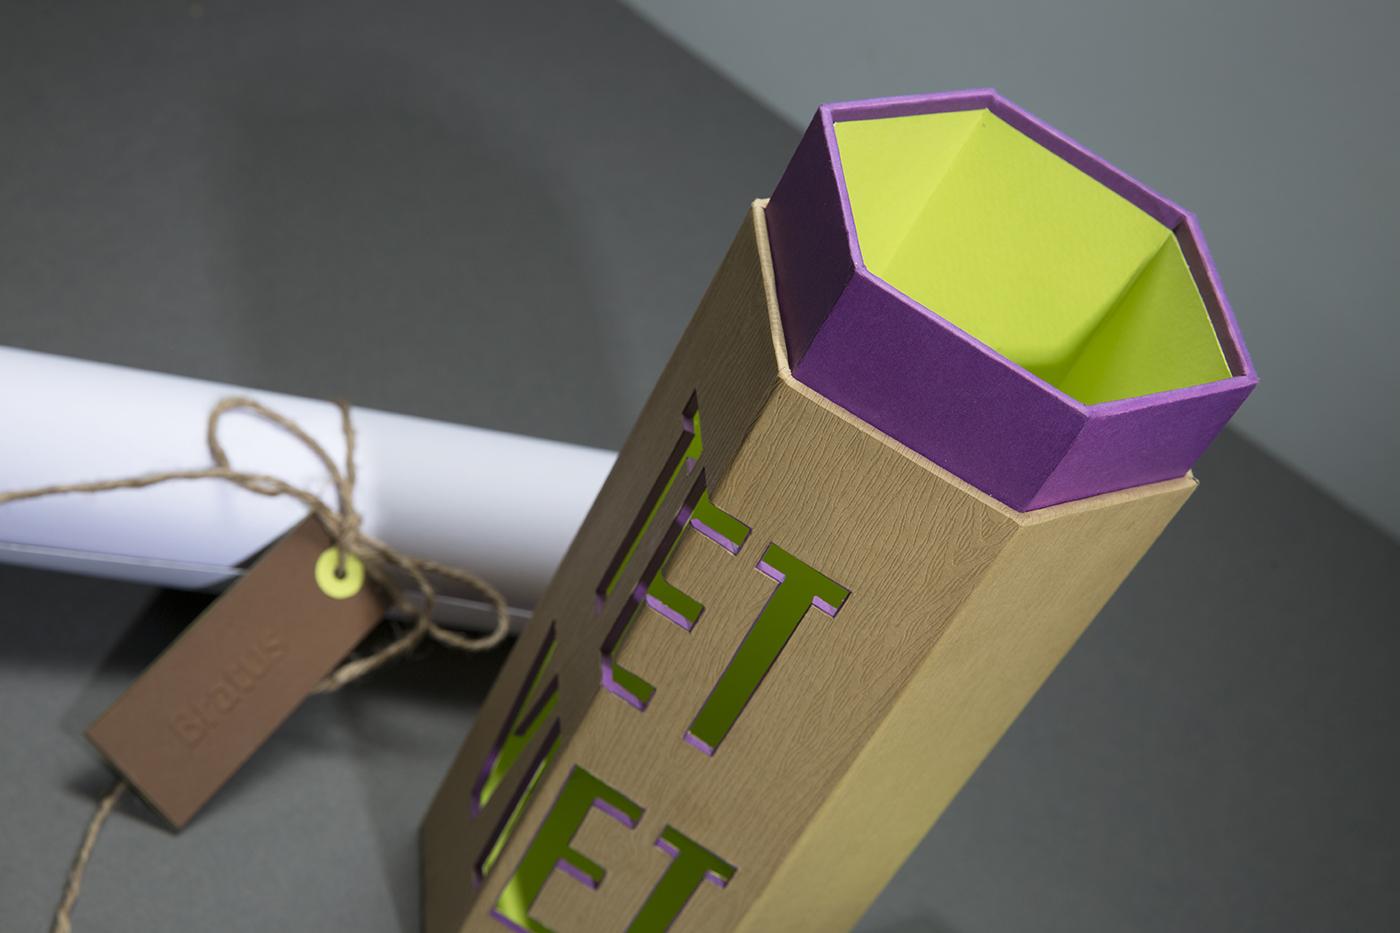 Vietnam Packaging design